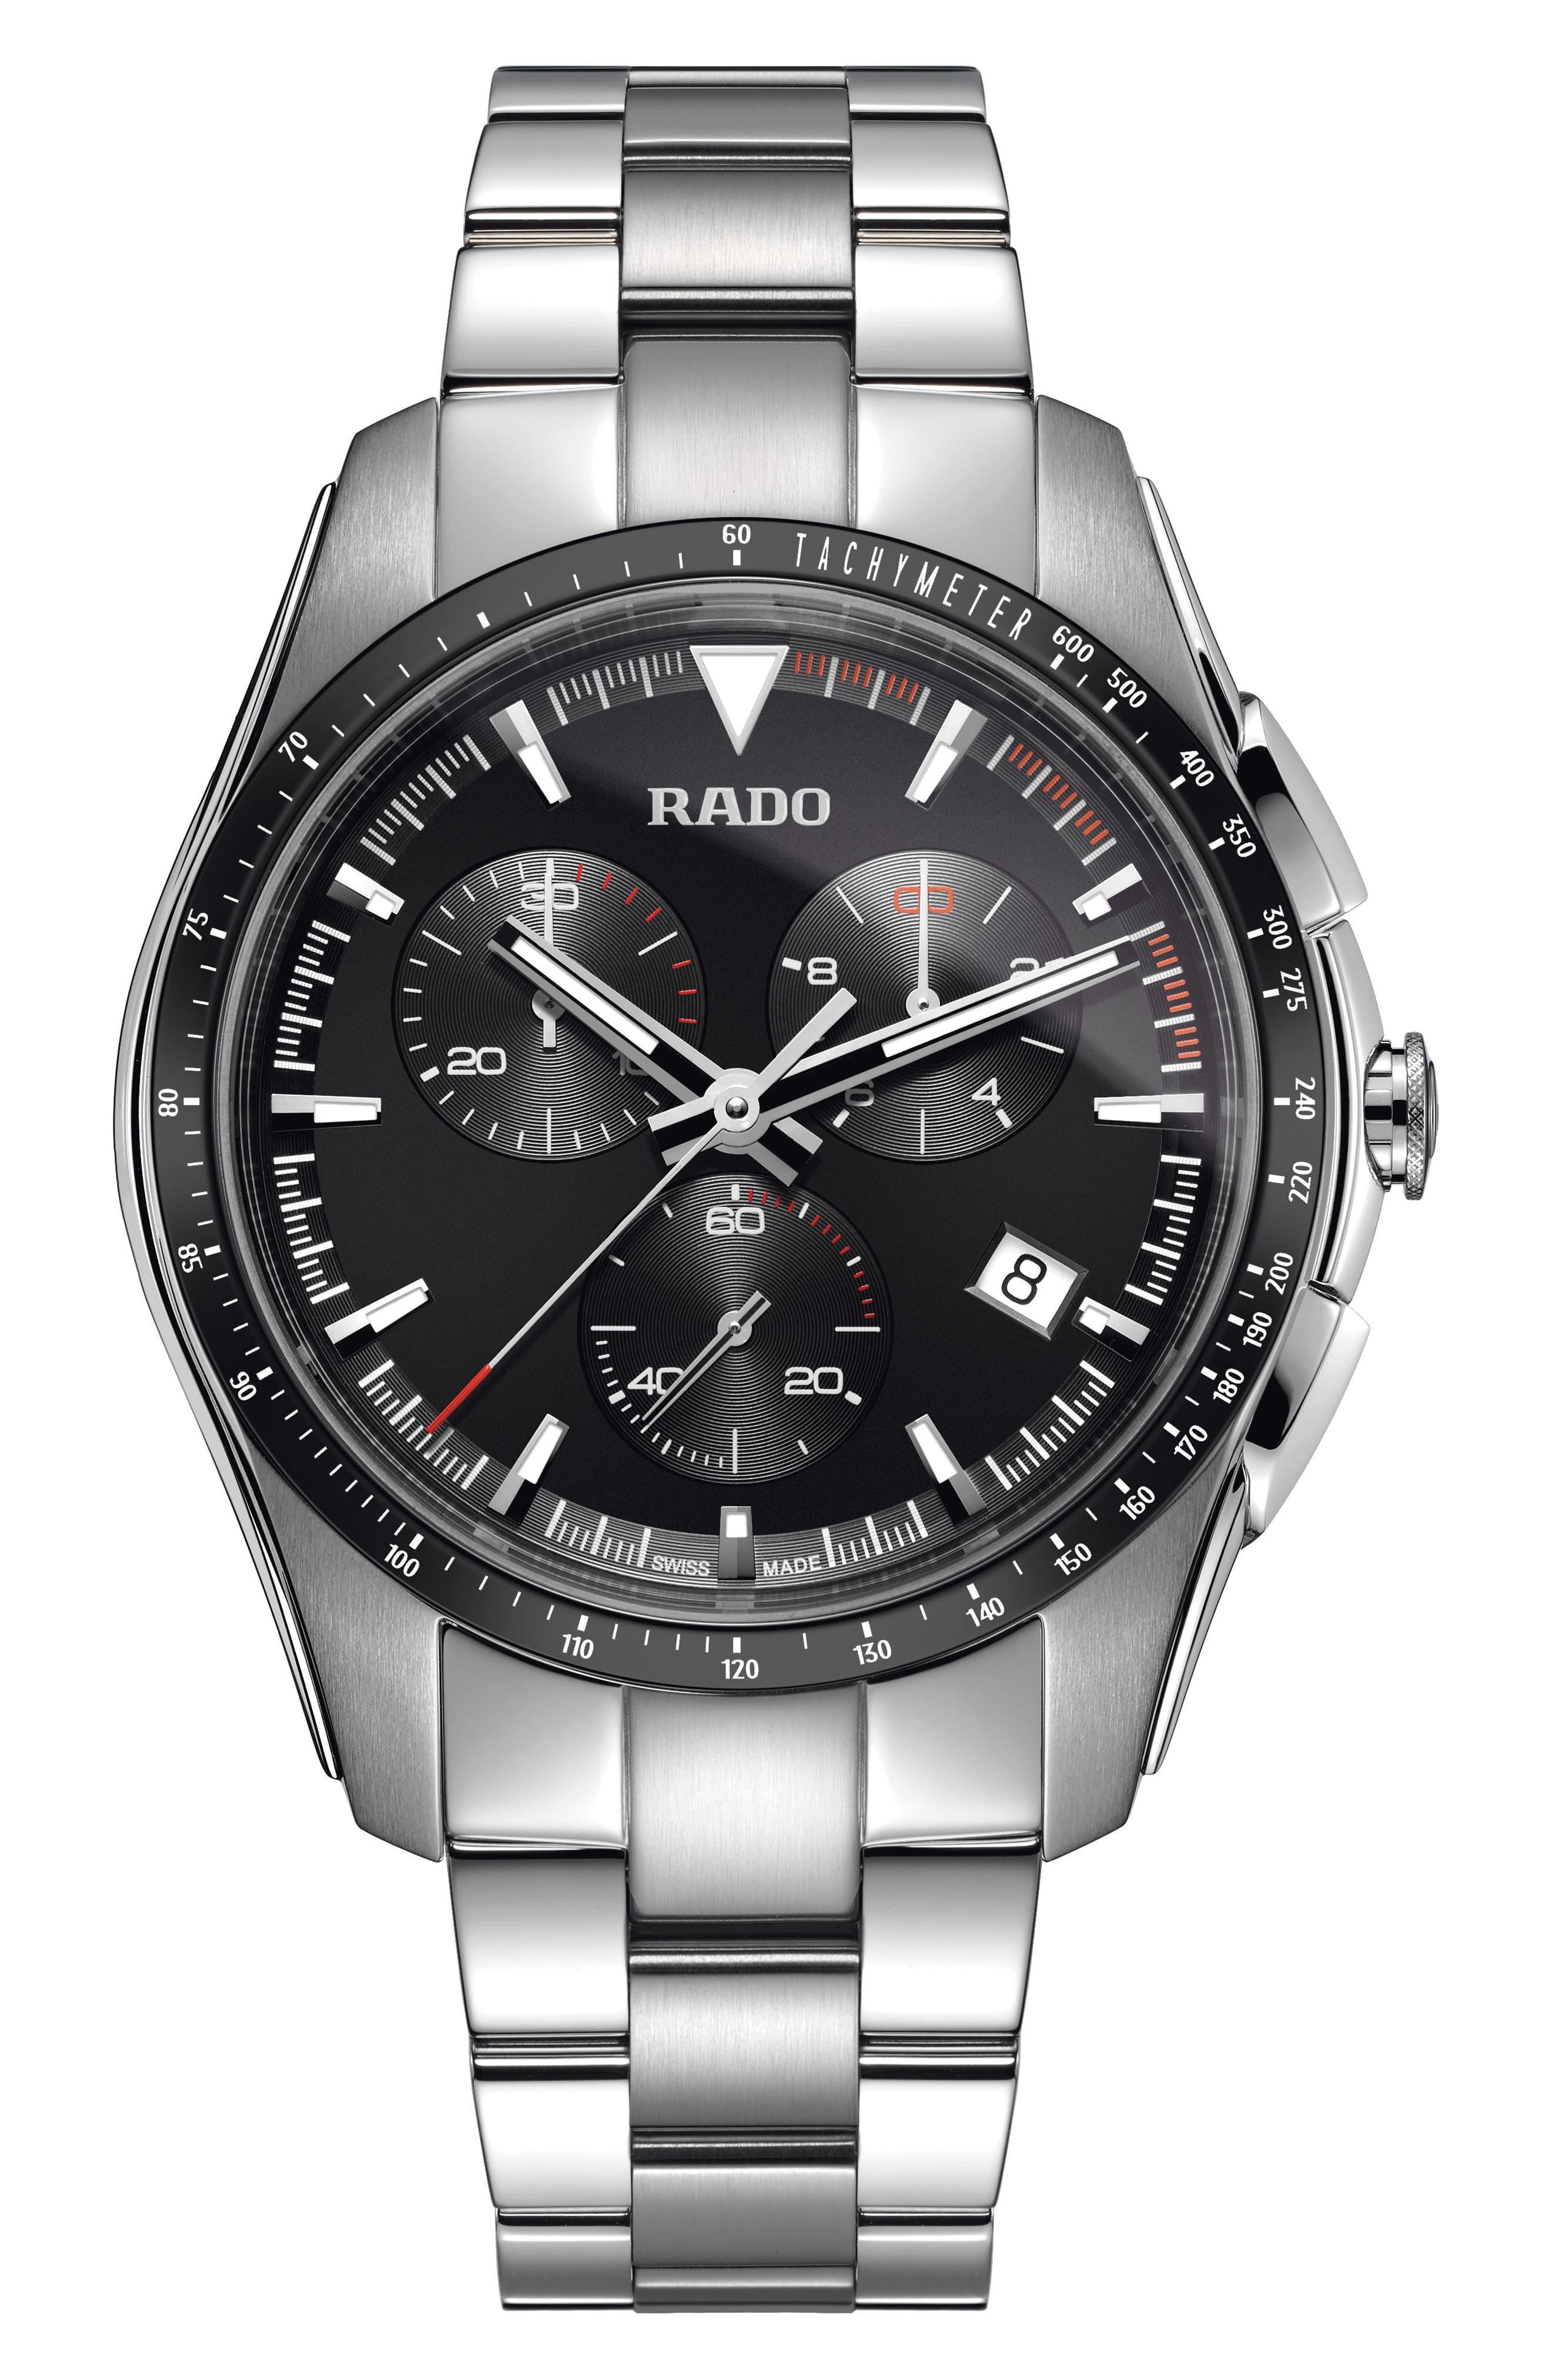 RADO Hyperchrome Chronograph Bracelet Watch, 45Mm in Silver/ Black/ Silver